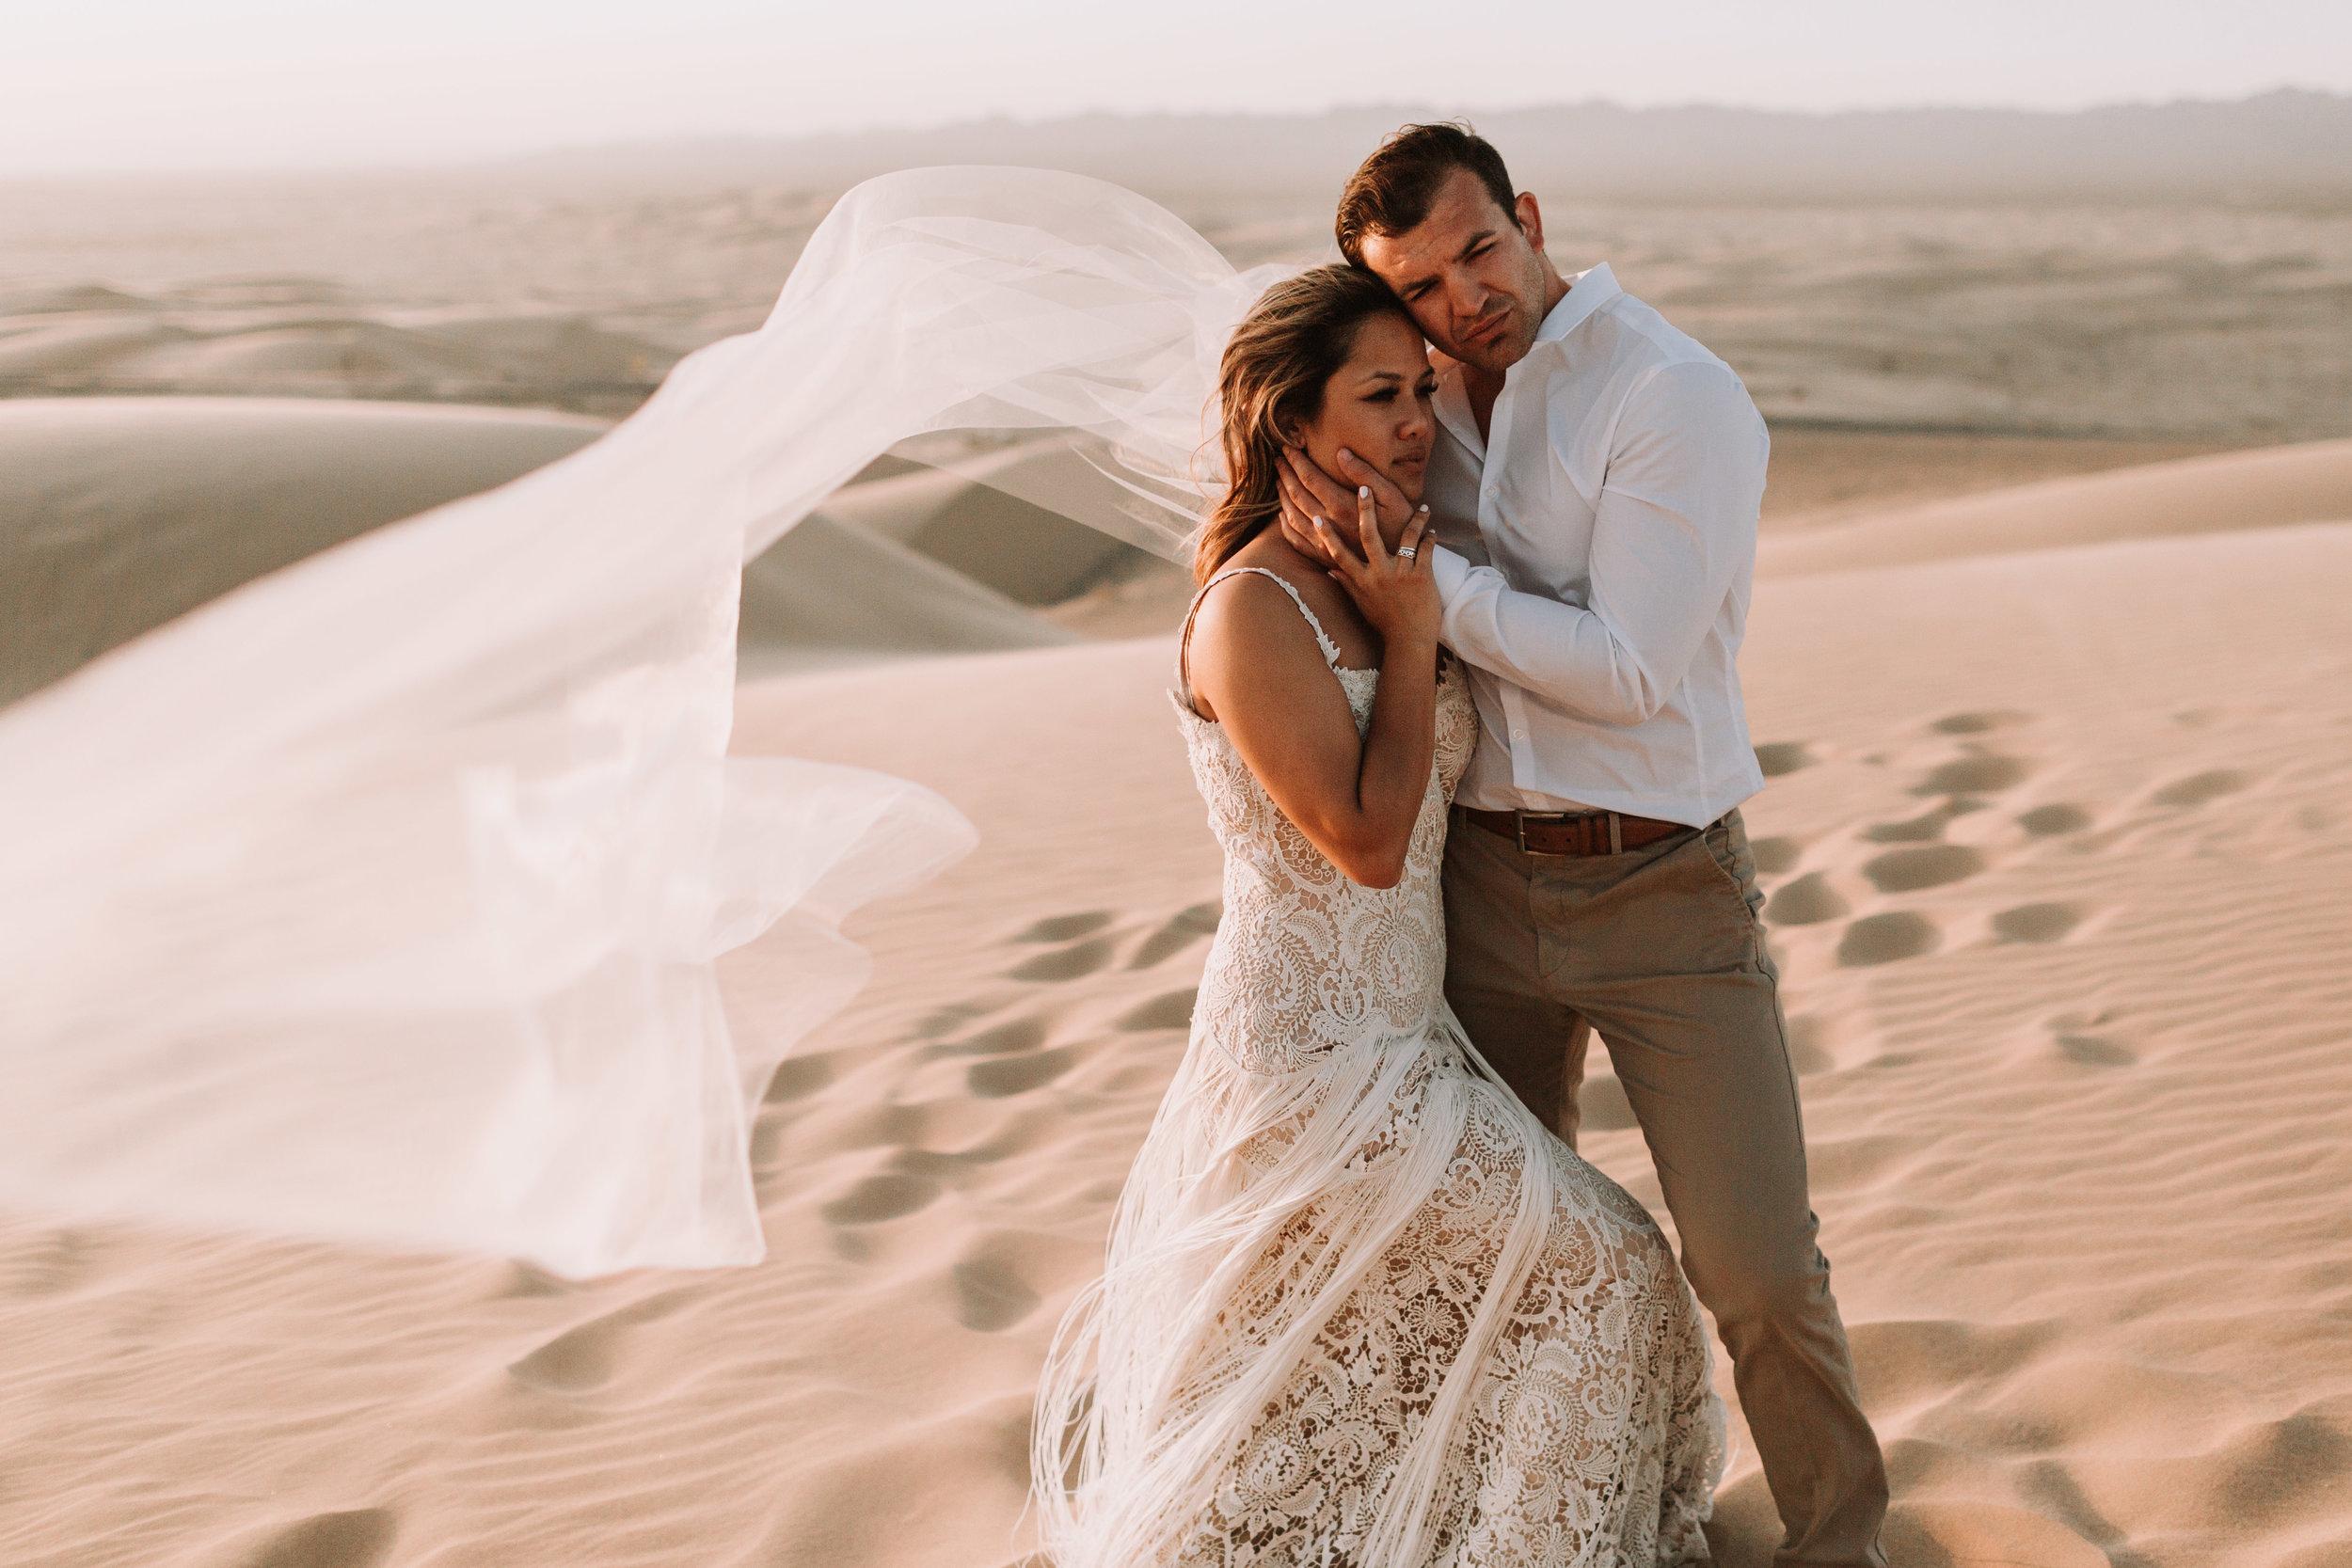 imperial sand dunes destination styled elopement wedding golden hour